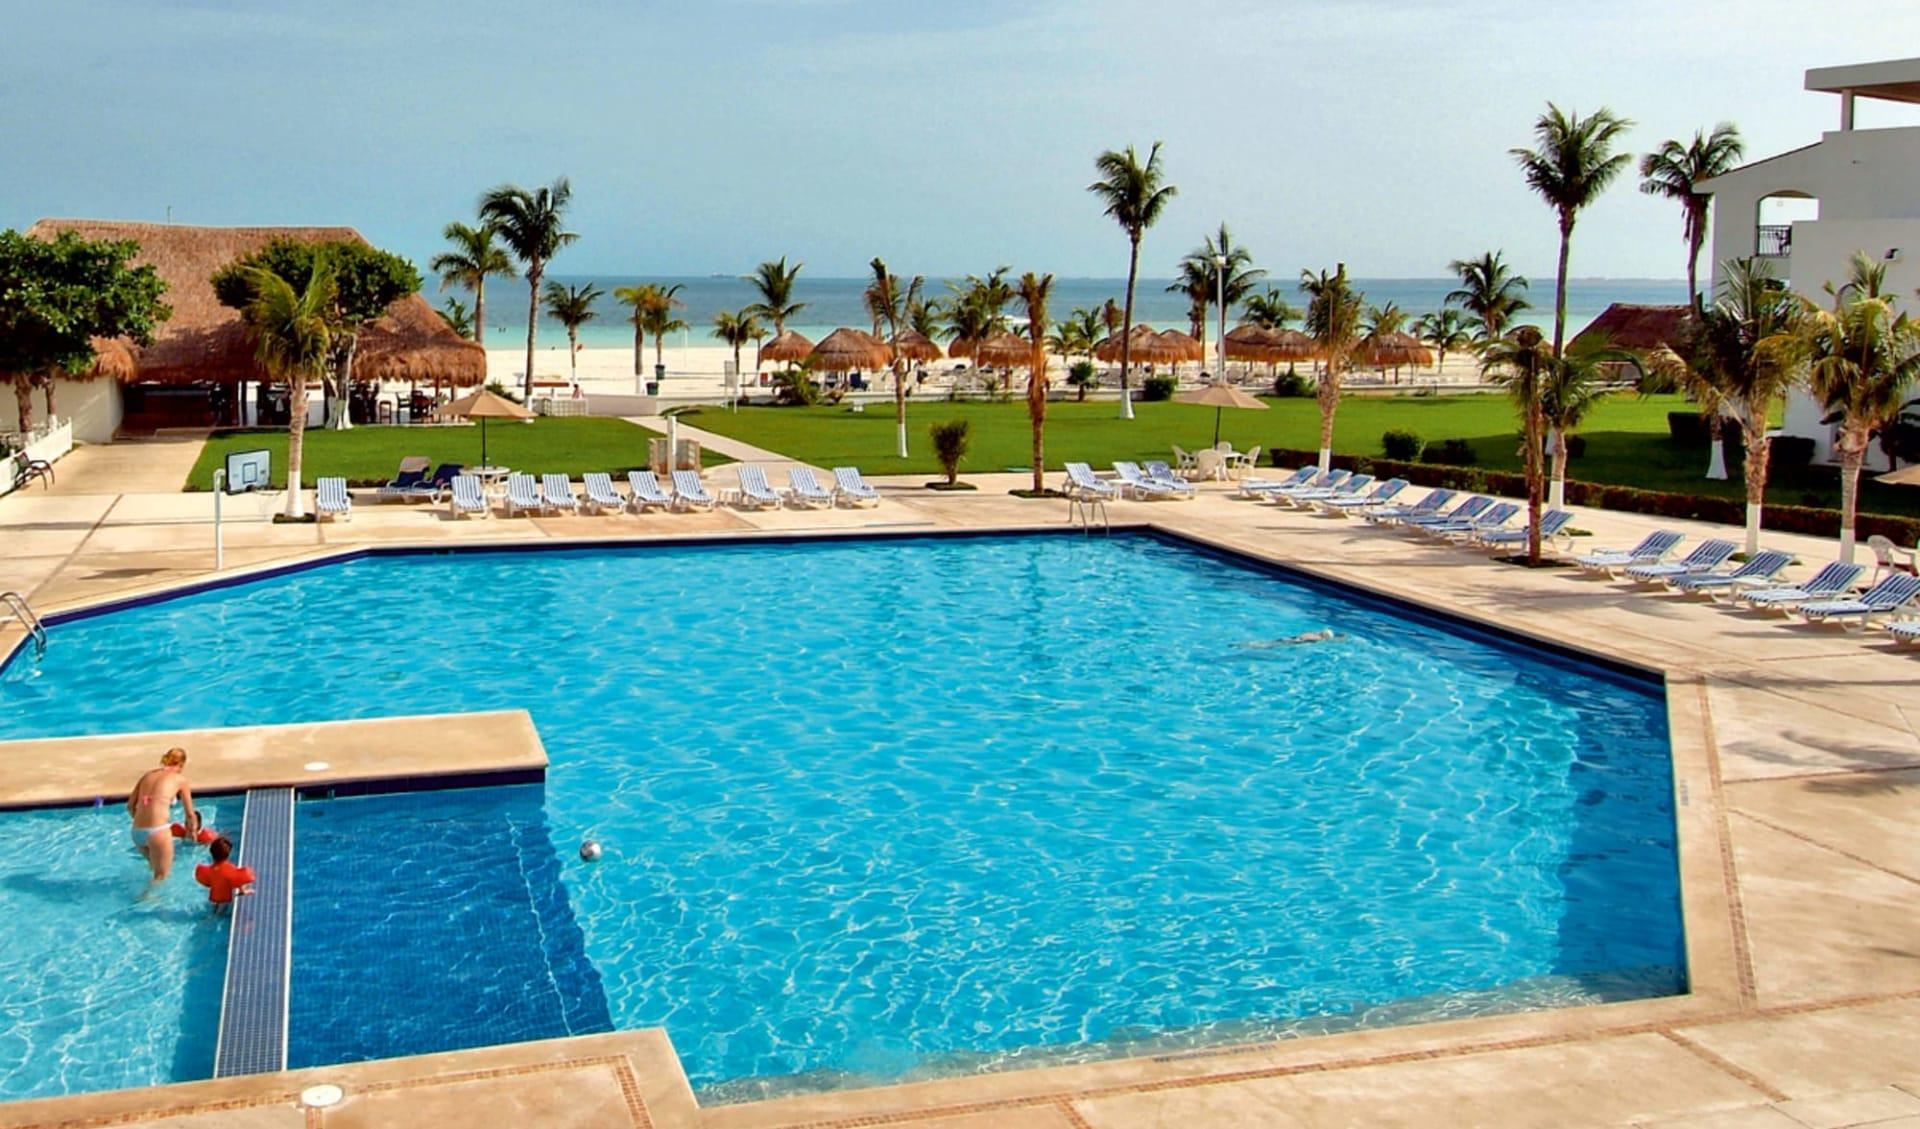 Beachscape Kin Ha Villas & Suites in Cancun:  Cancun_Beachscape Kin Ha Villas_Pool